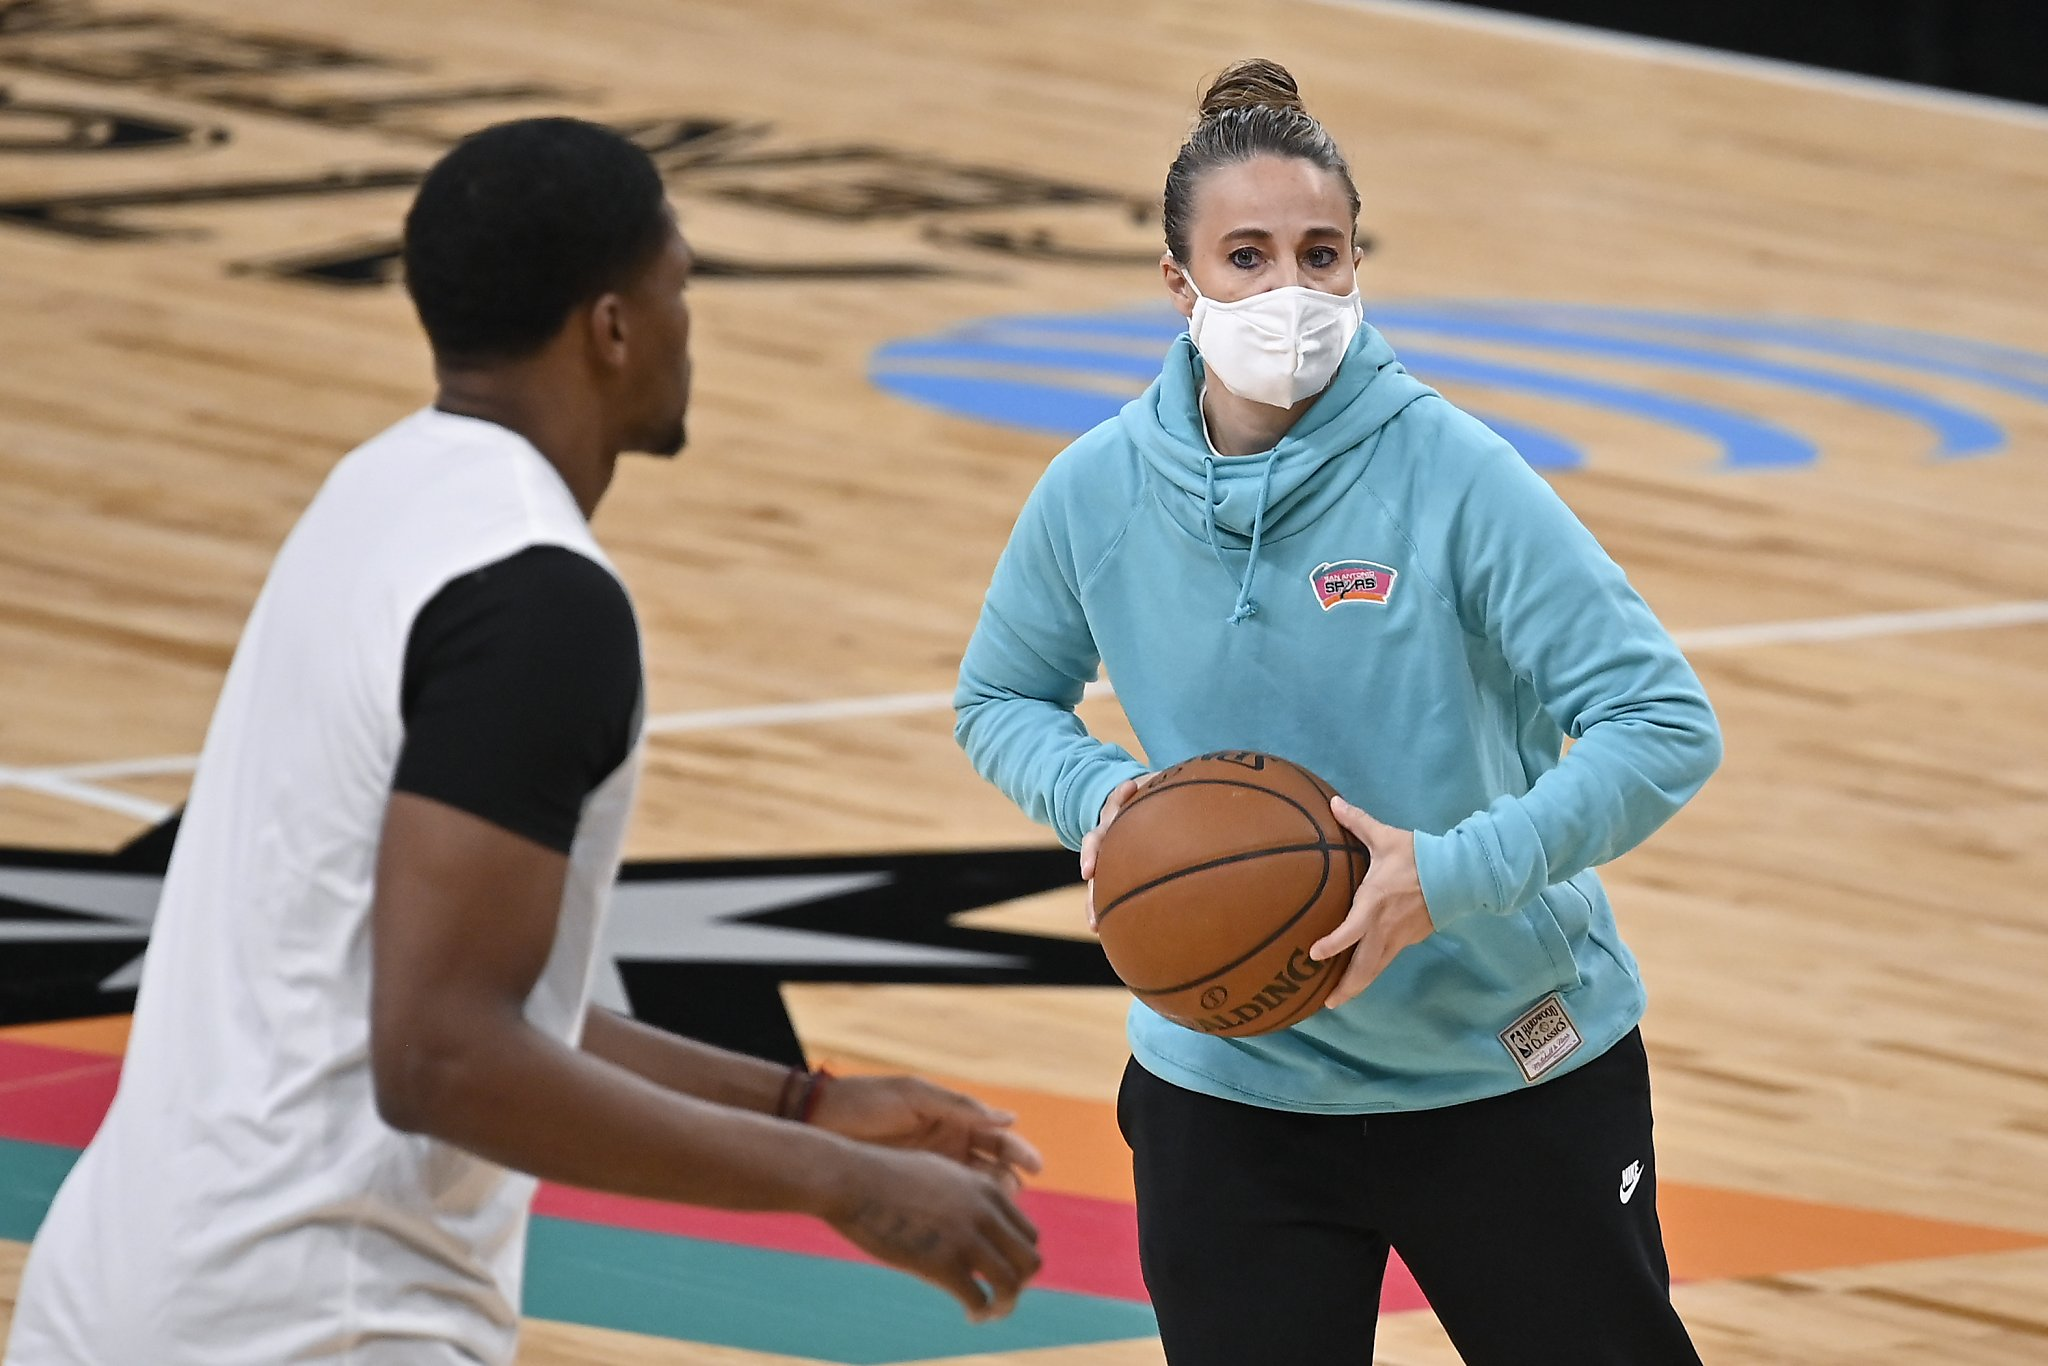 'Just unfair': WNBA coach says Becky Hammon would already be an NBA head coach if she were a man